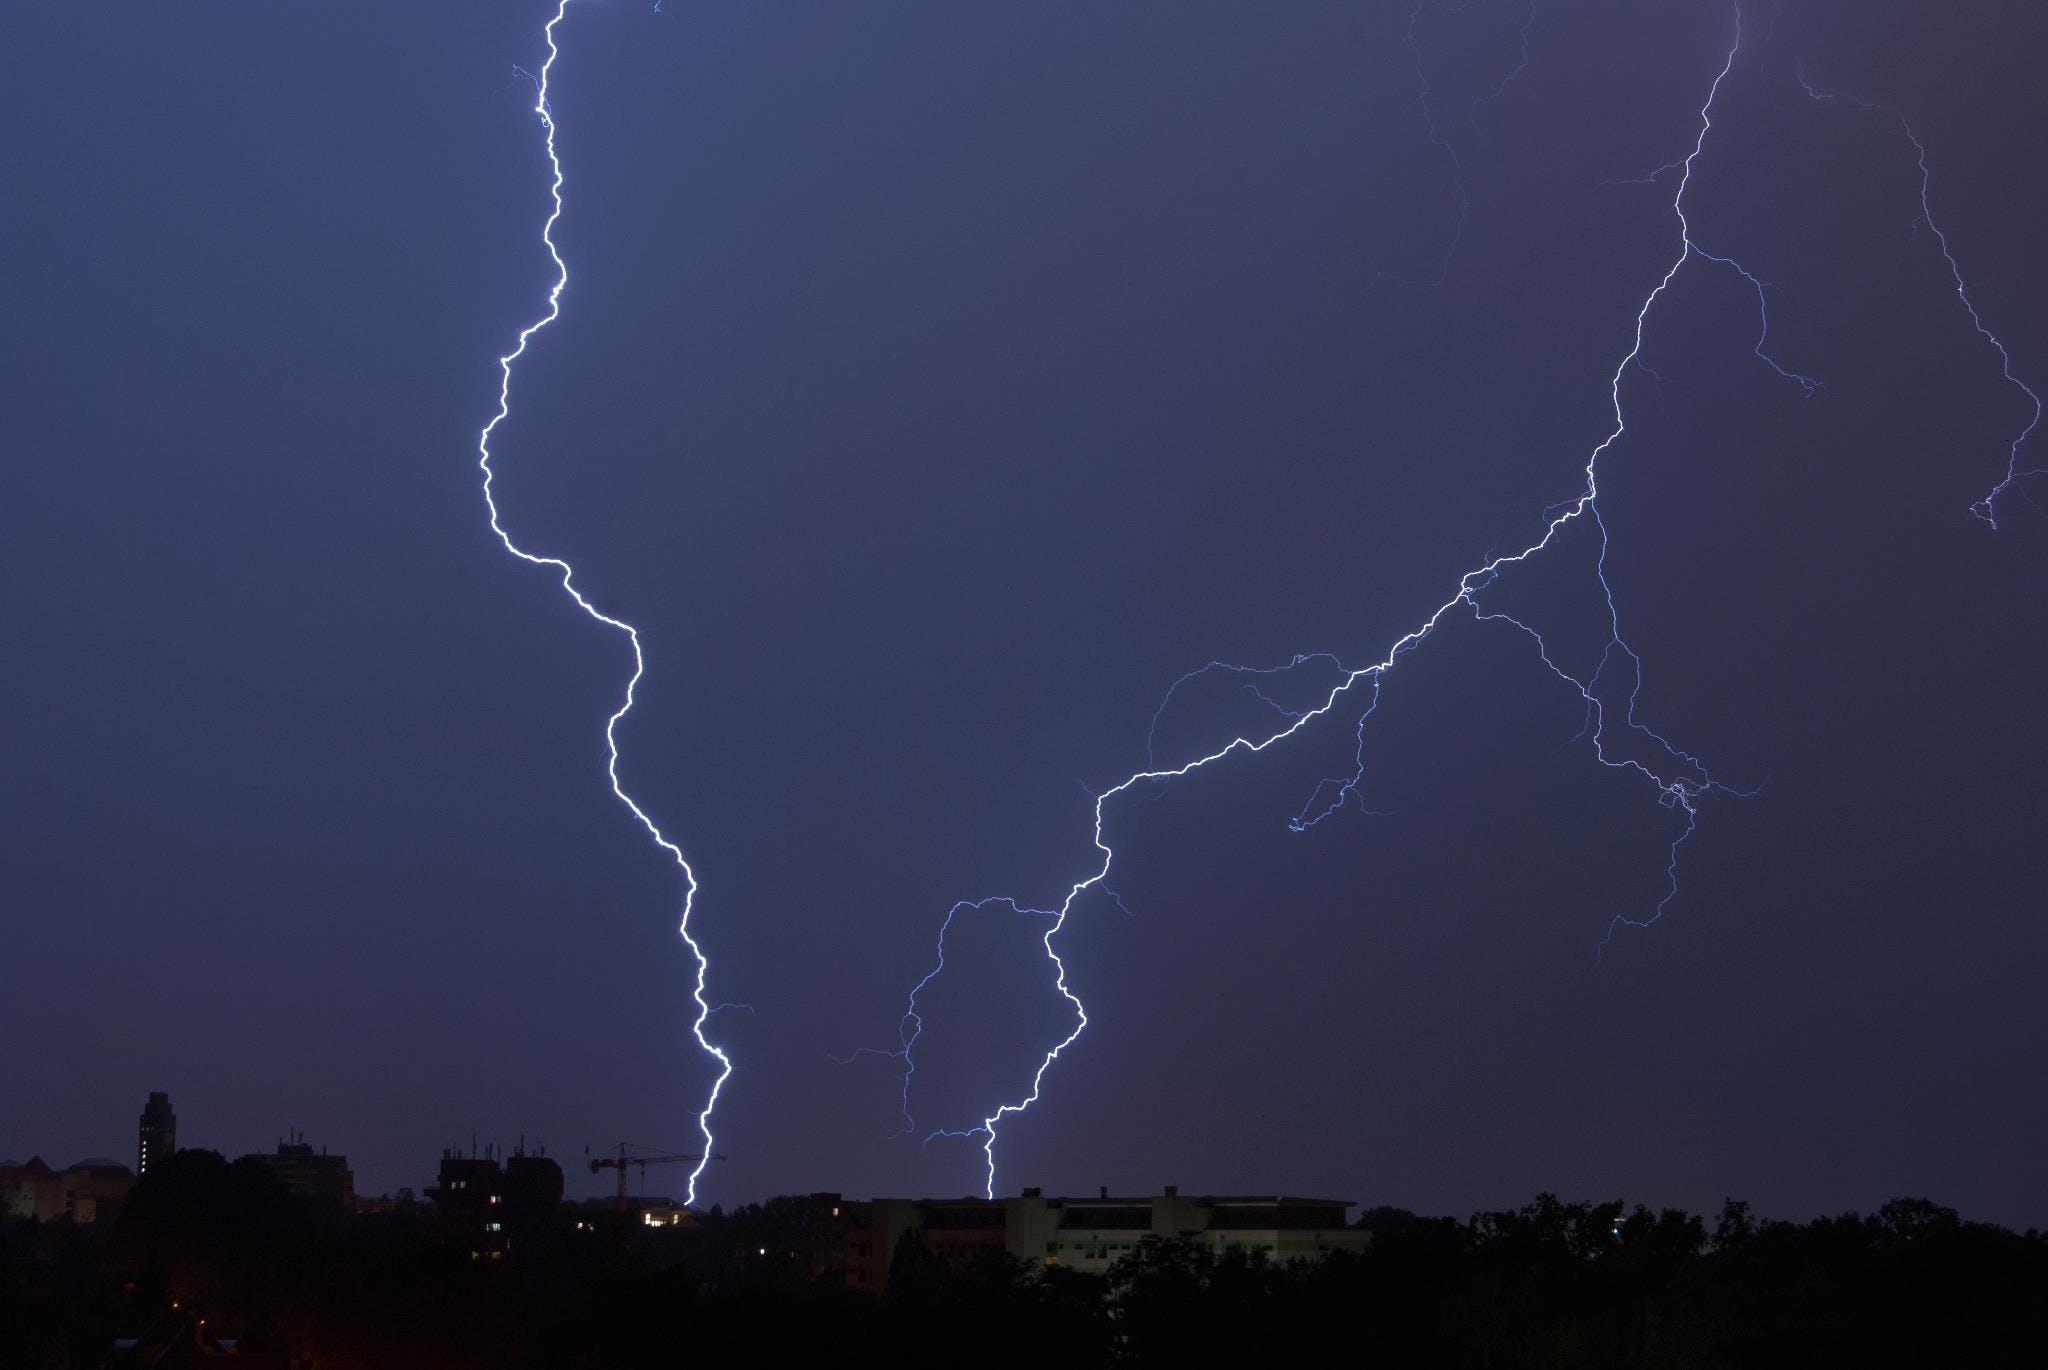 Lightning Bolt Hitting on the Ground